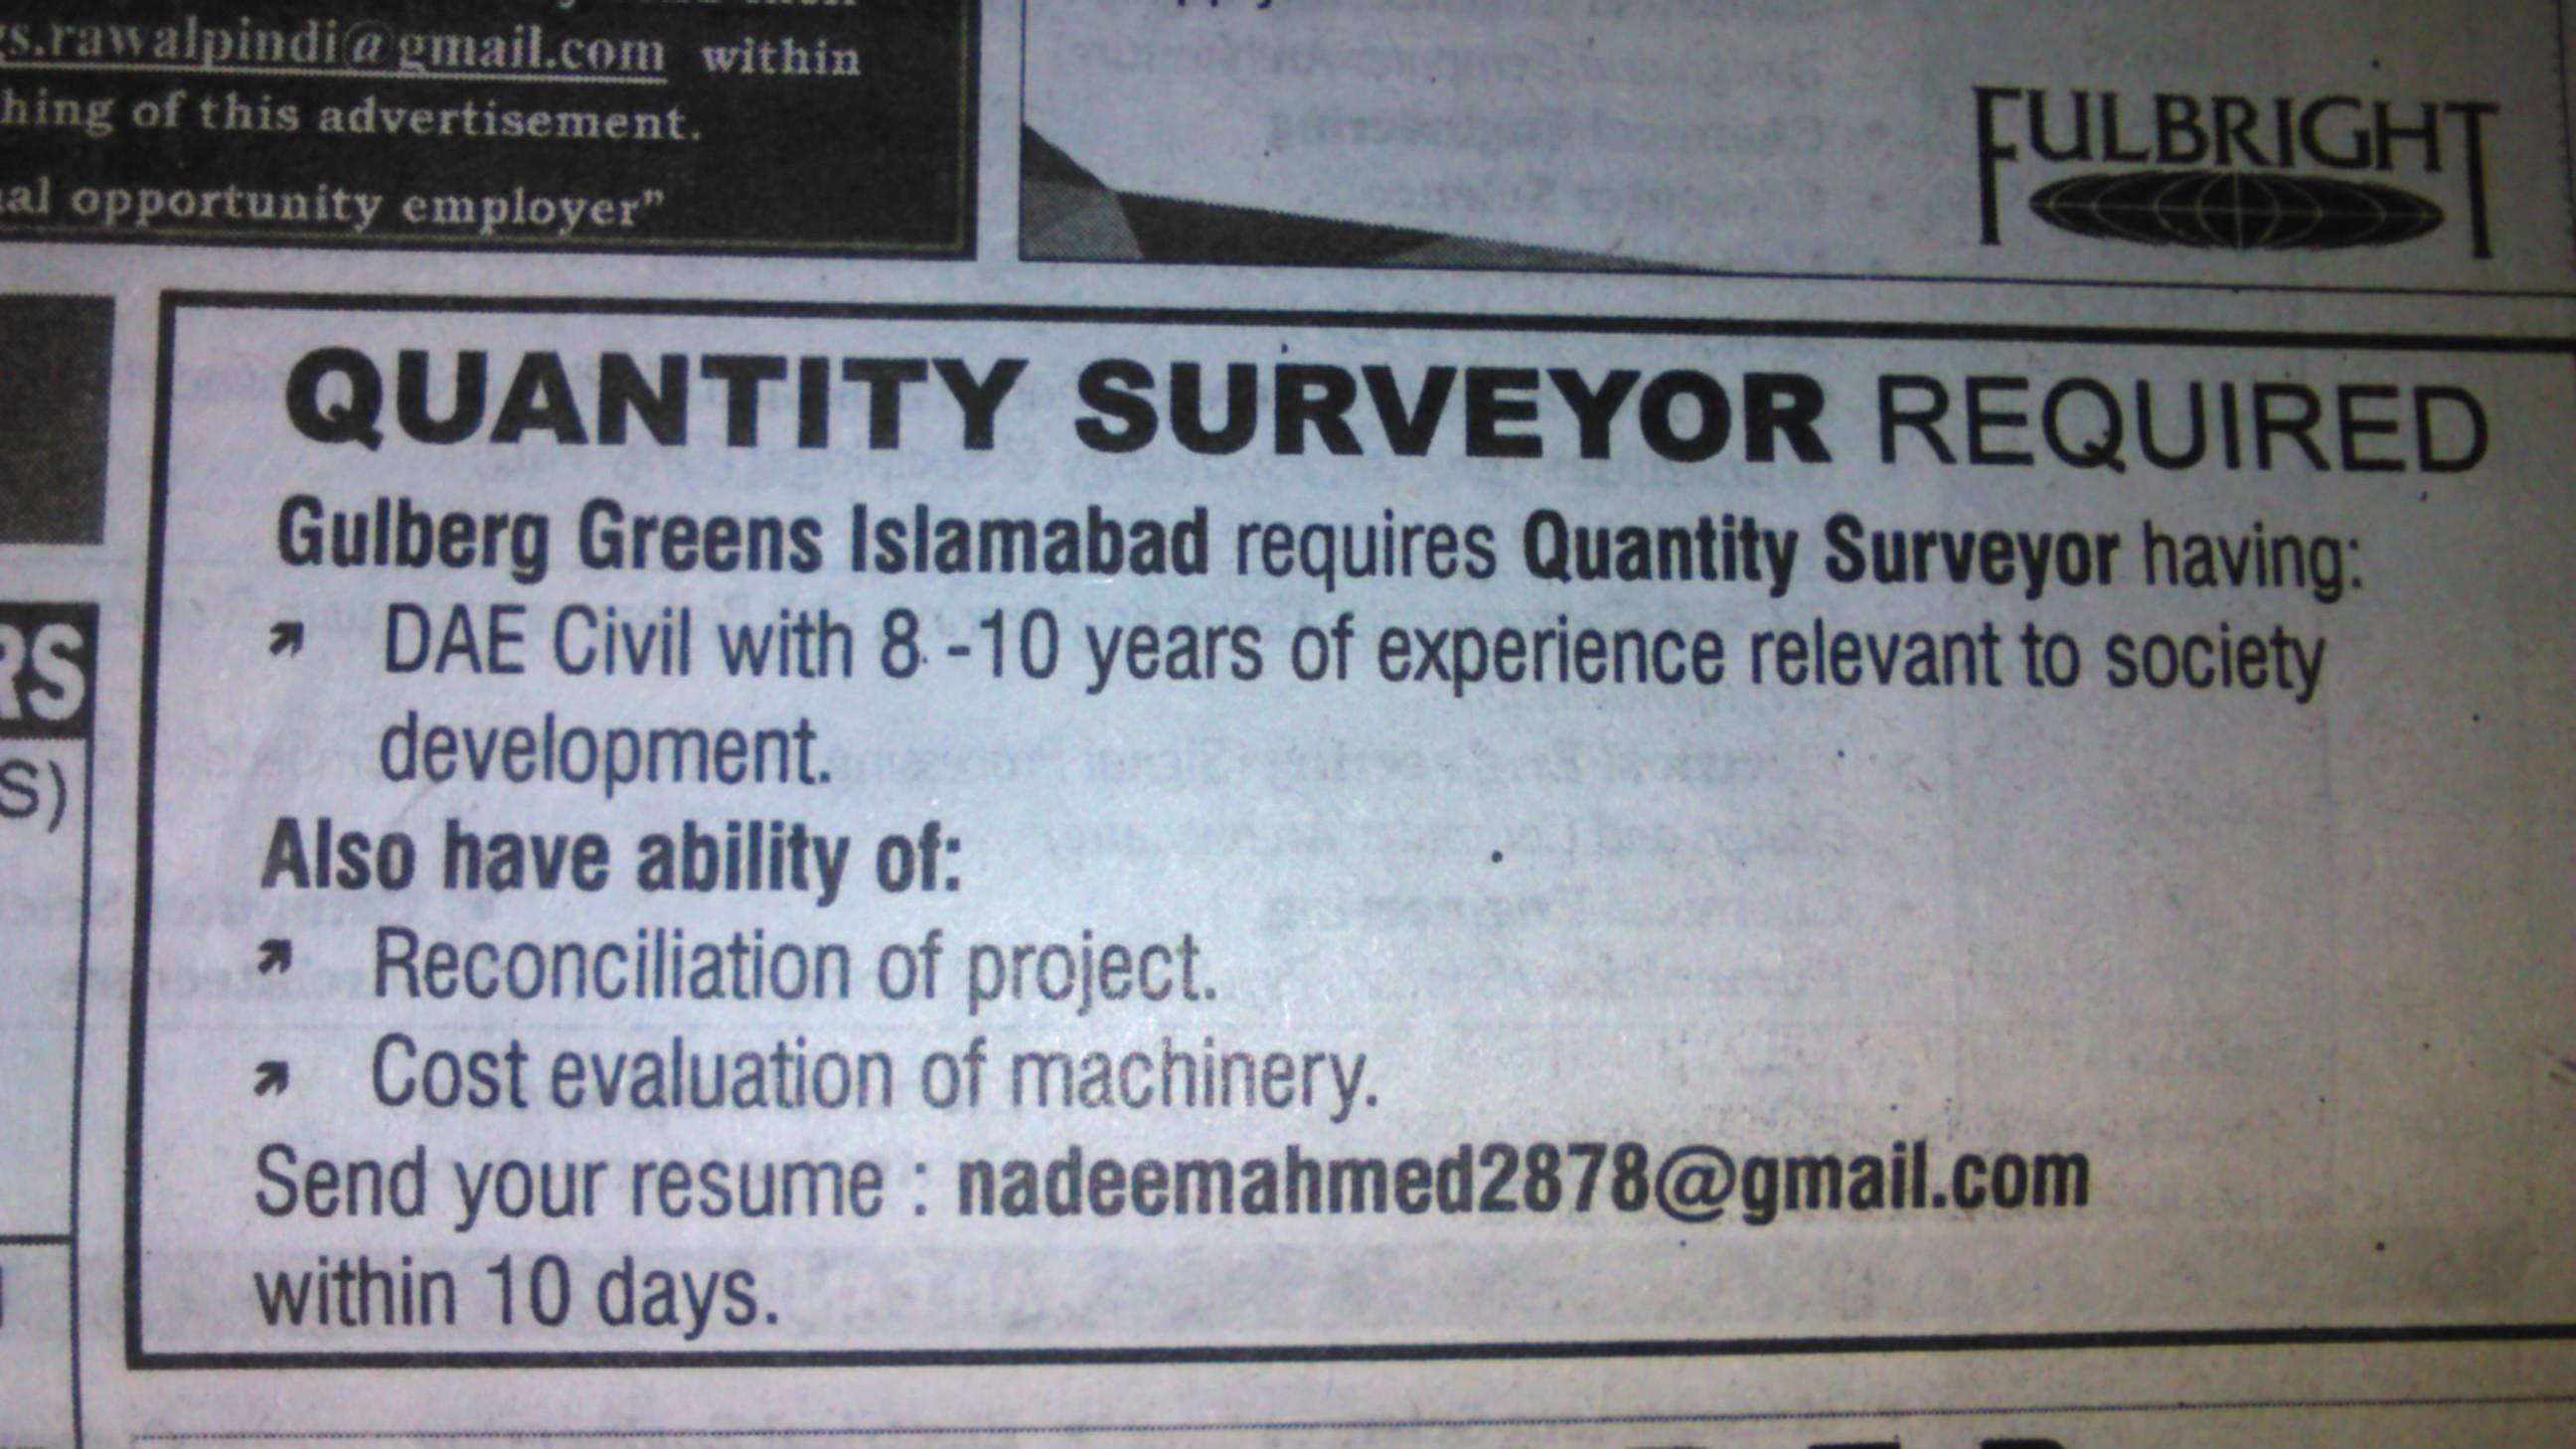 Gulberg Greens Islamabad Quantity Surveyor Required